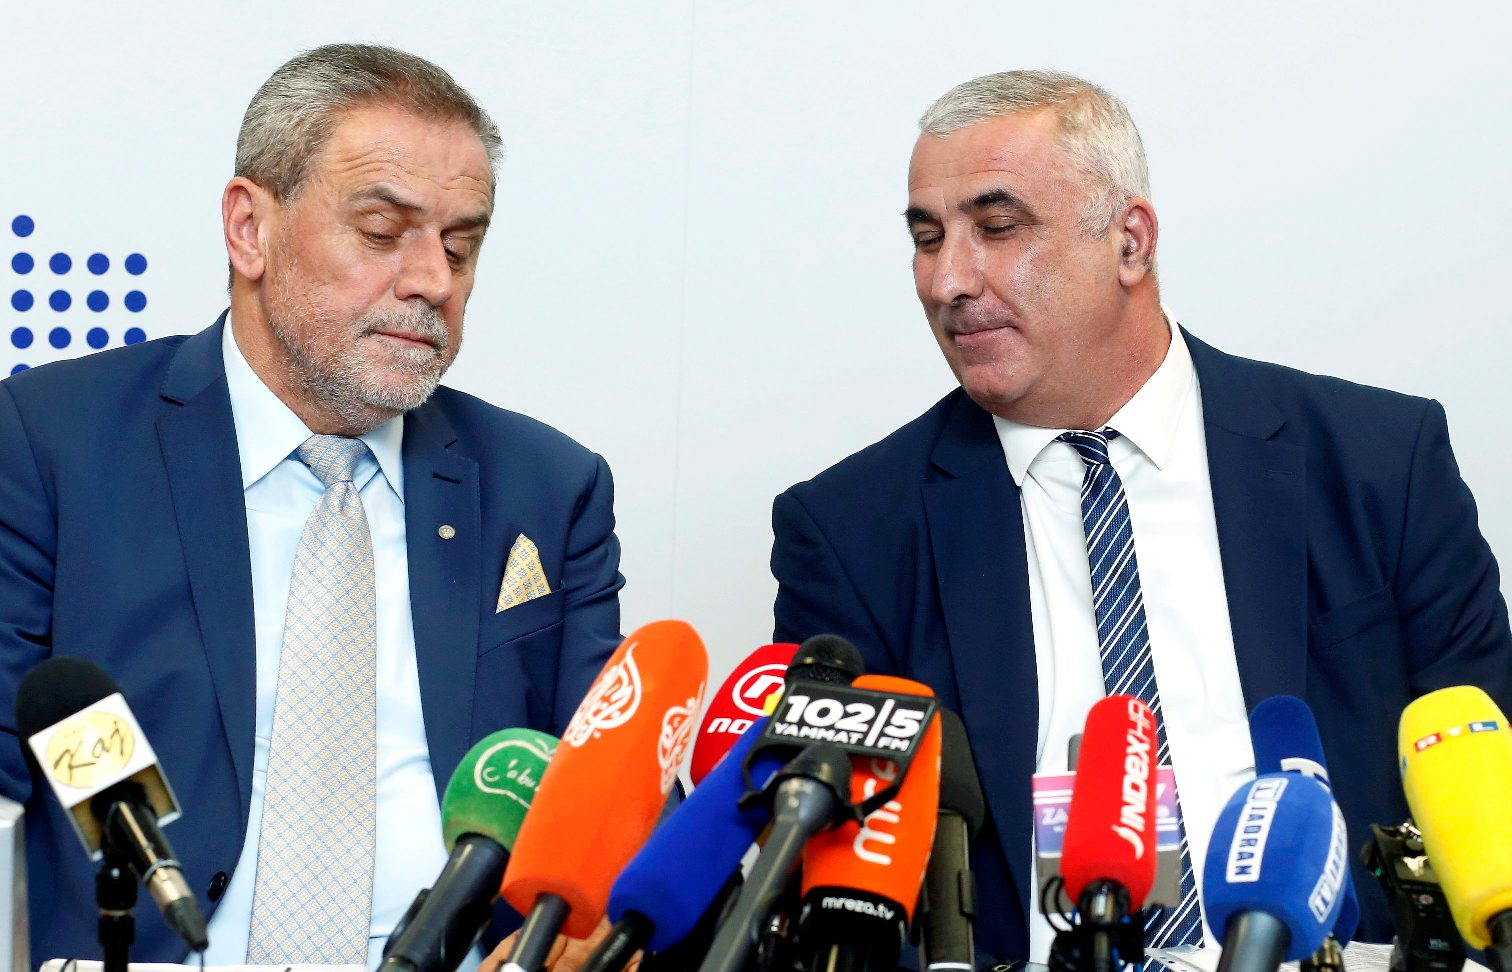 Milan Bandić i Mladen Mađer